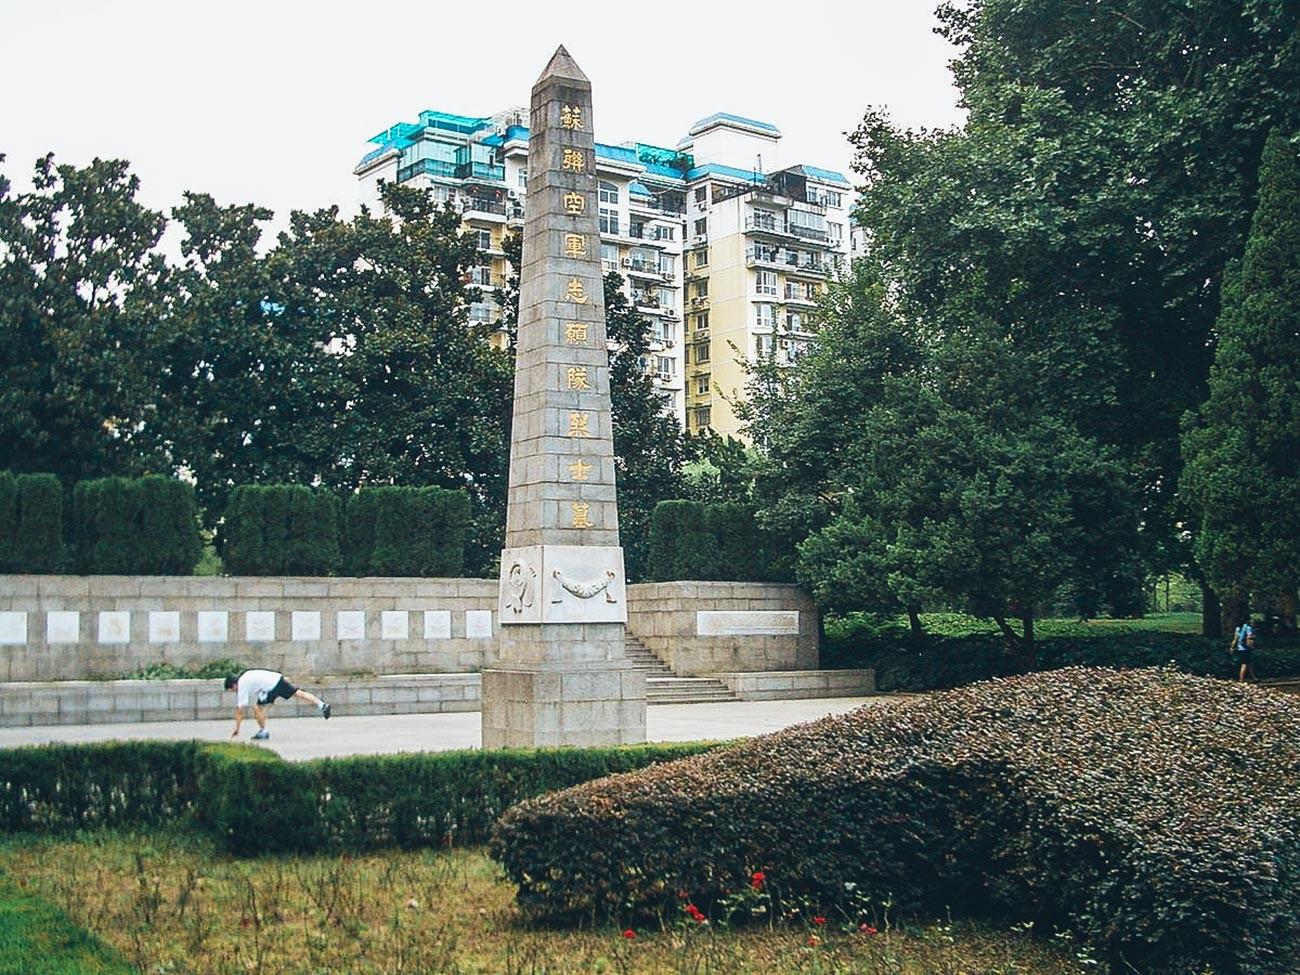 Denkmal an den Gräbern der sowjetischen Flieger in Wuhan.